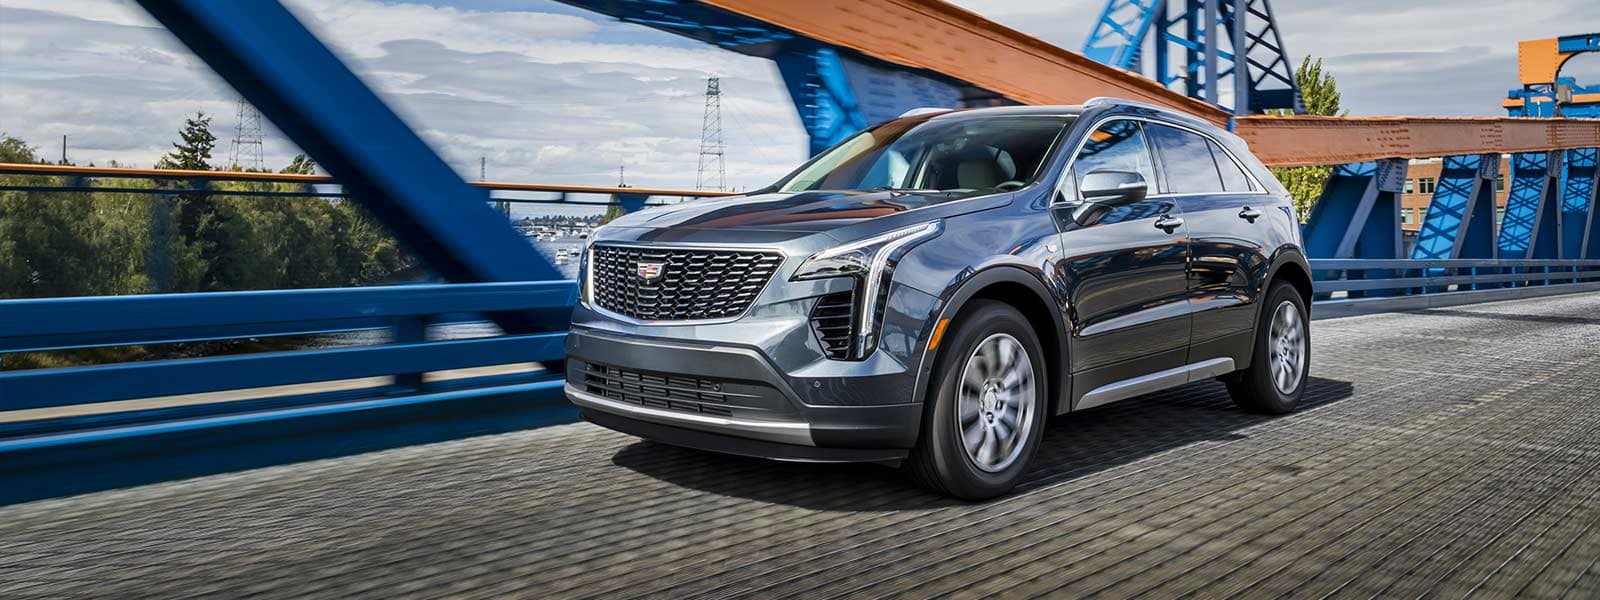 Buy or lease 2021 Cadillac XT4 in Woodbridge Ontario